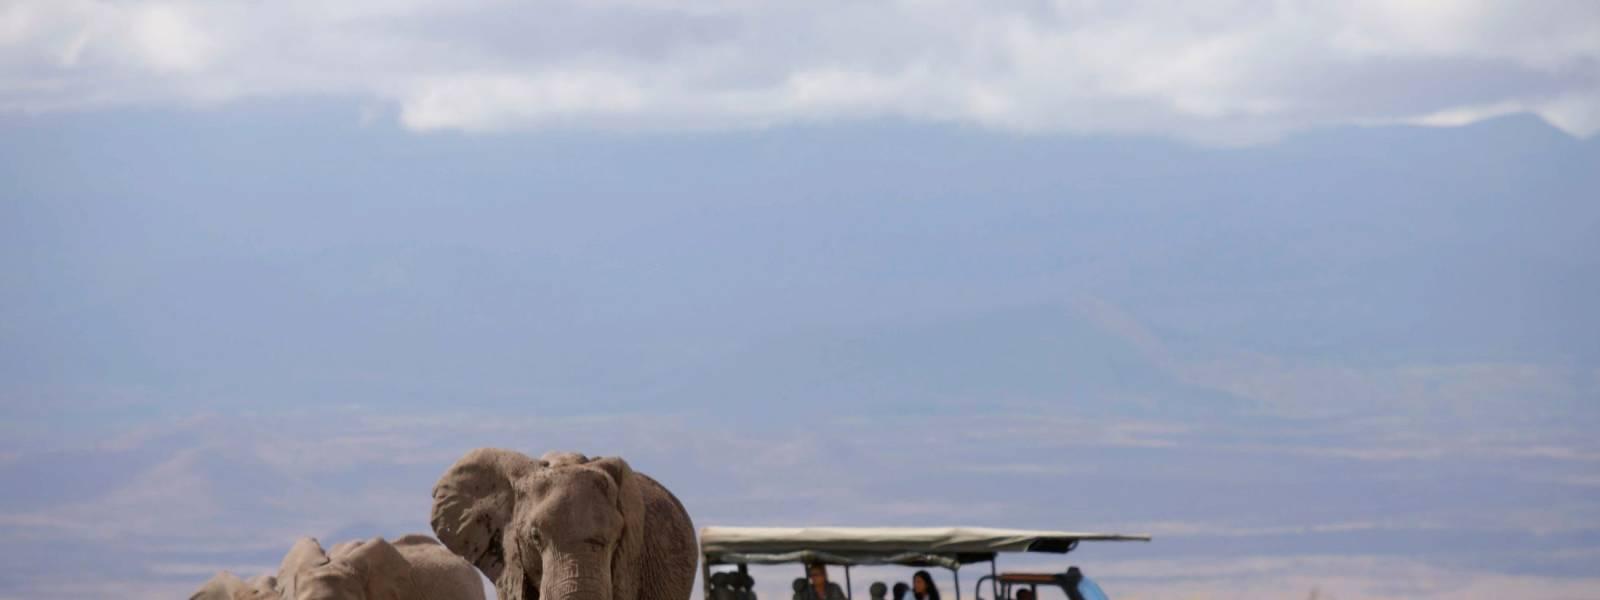 a herd of elephants walking across a grass covered field